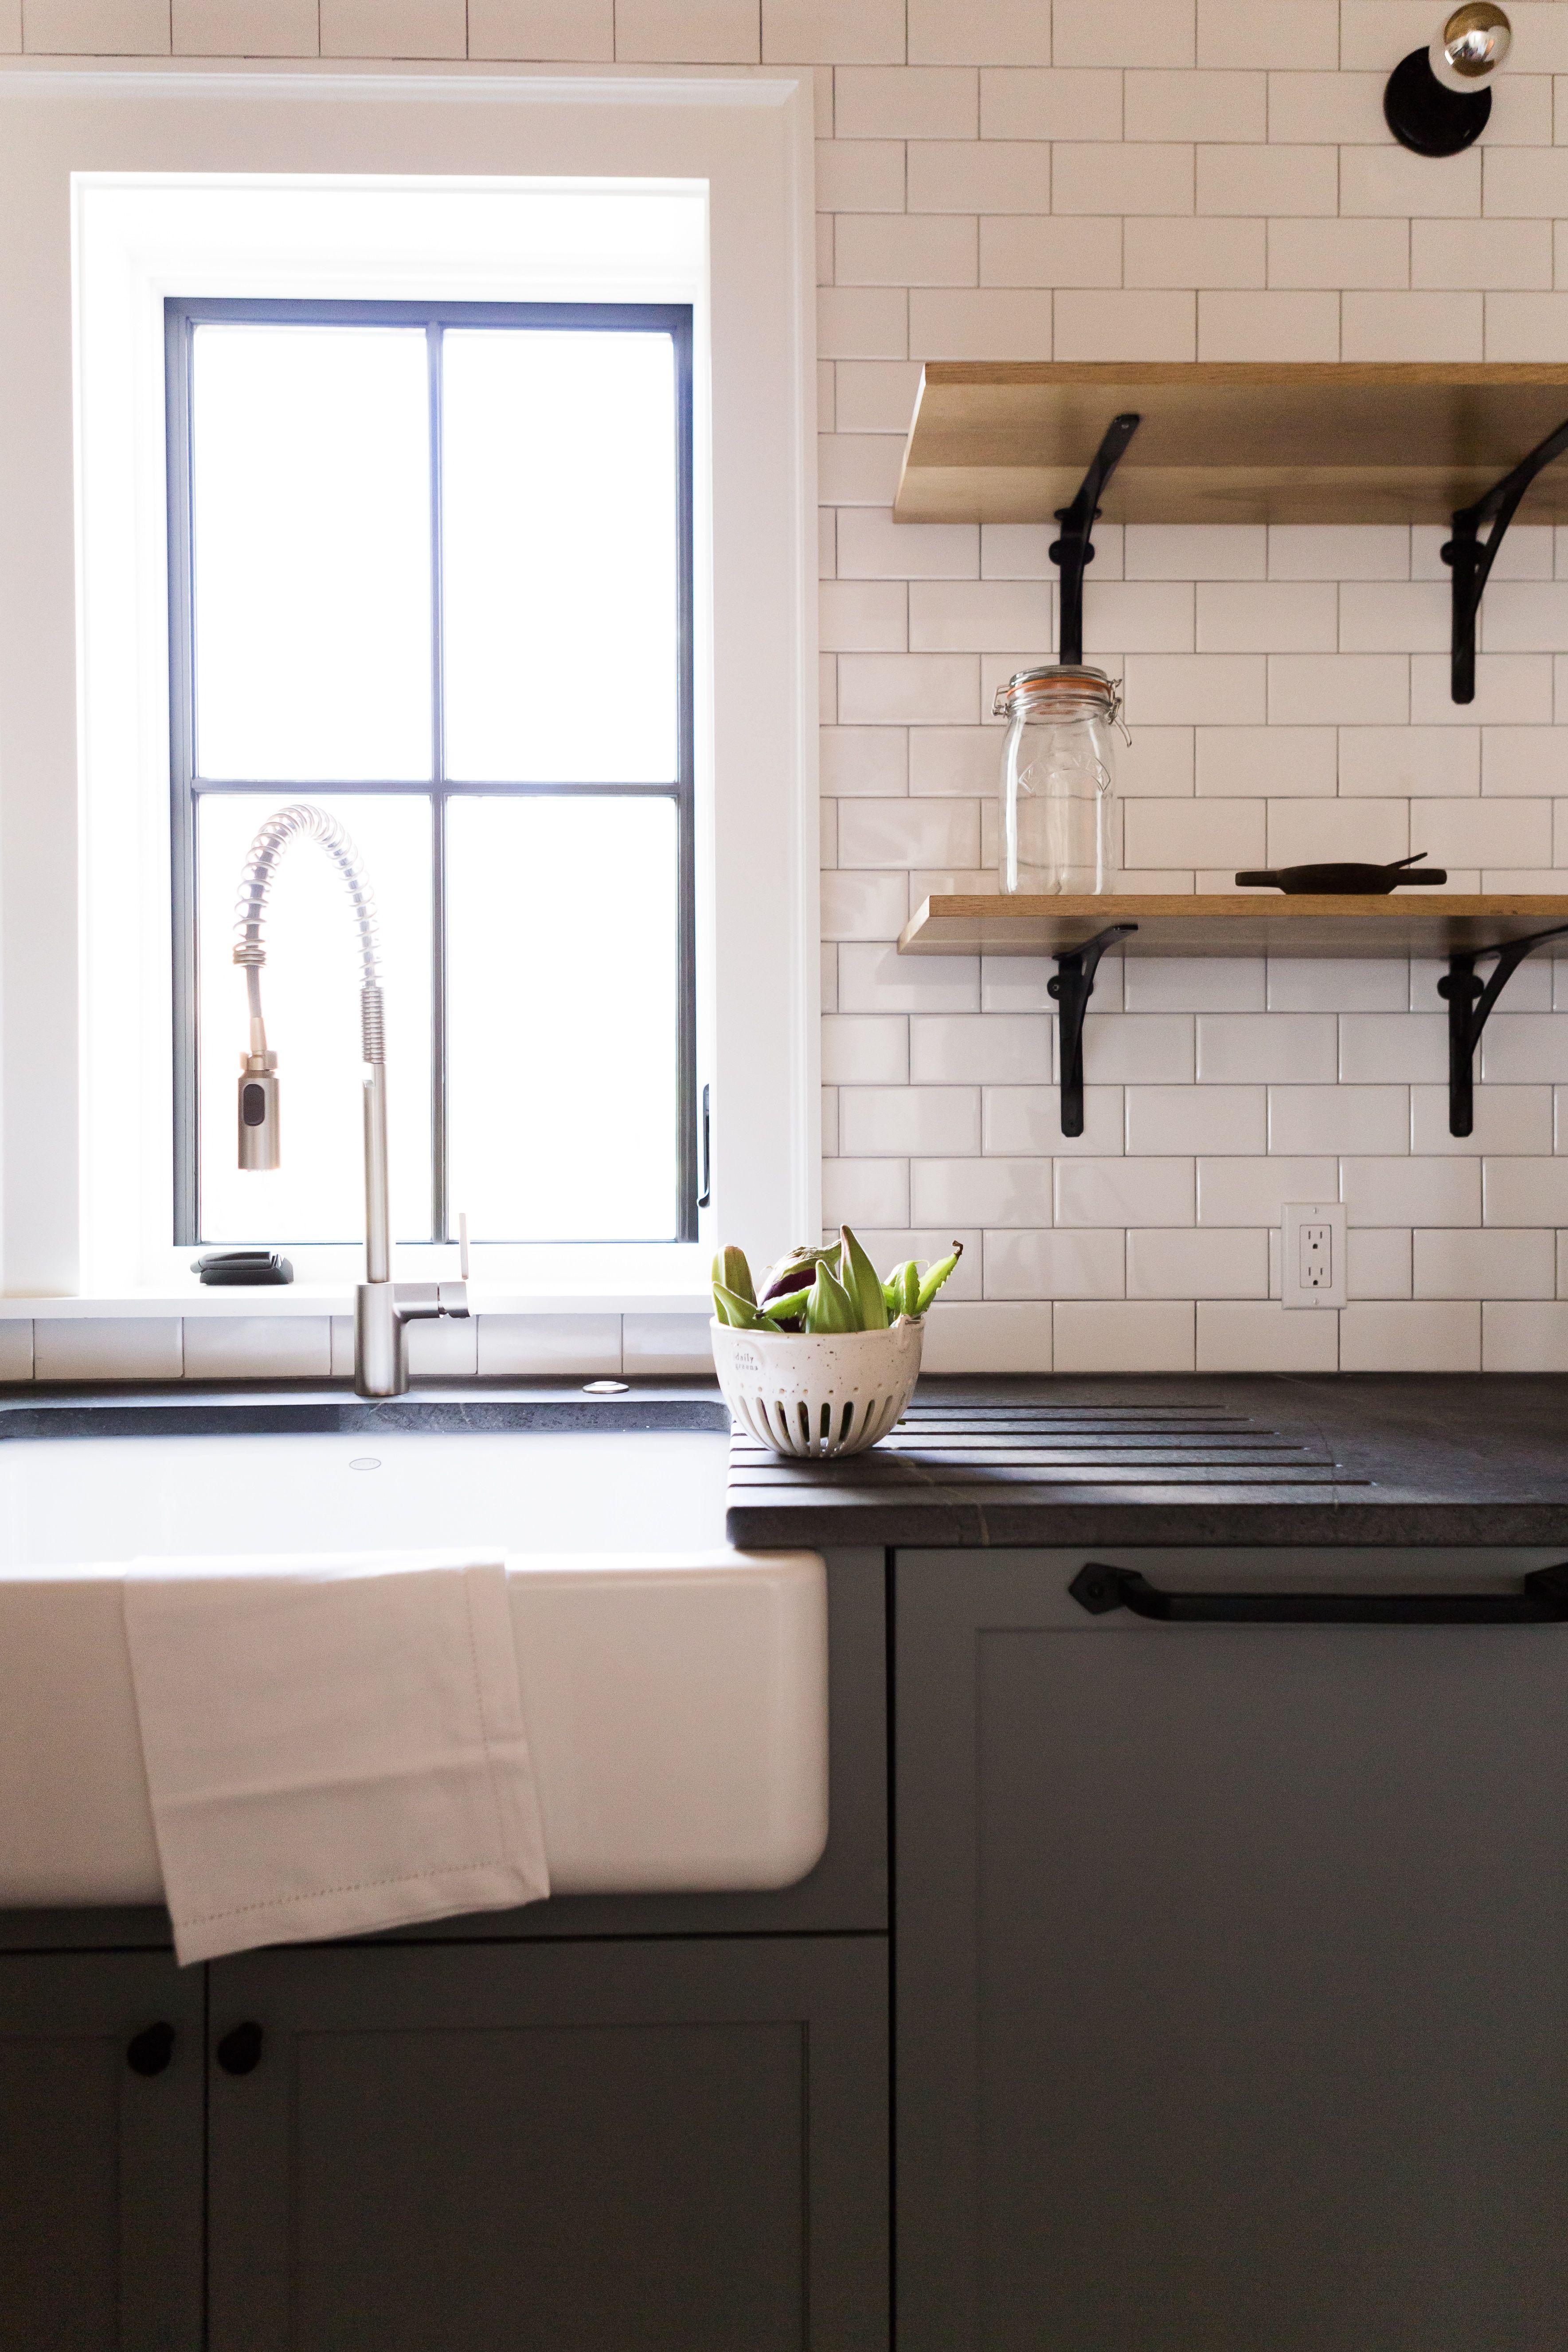 Küchendesignhaus farmhouse kitchen kitchendesign countertops cabinets